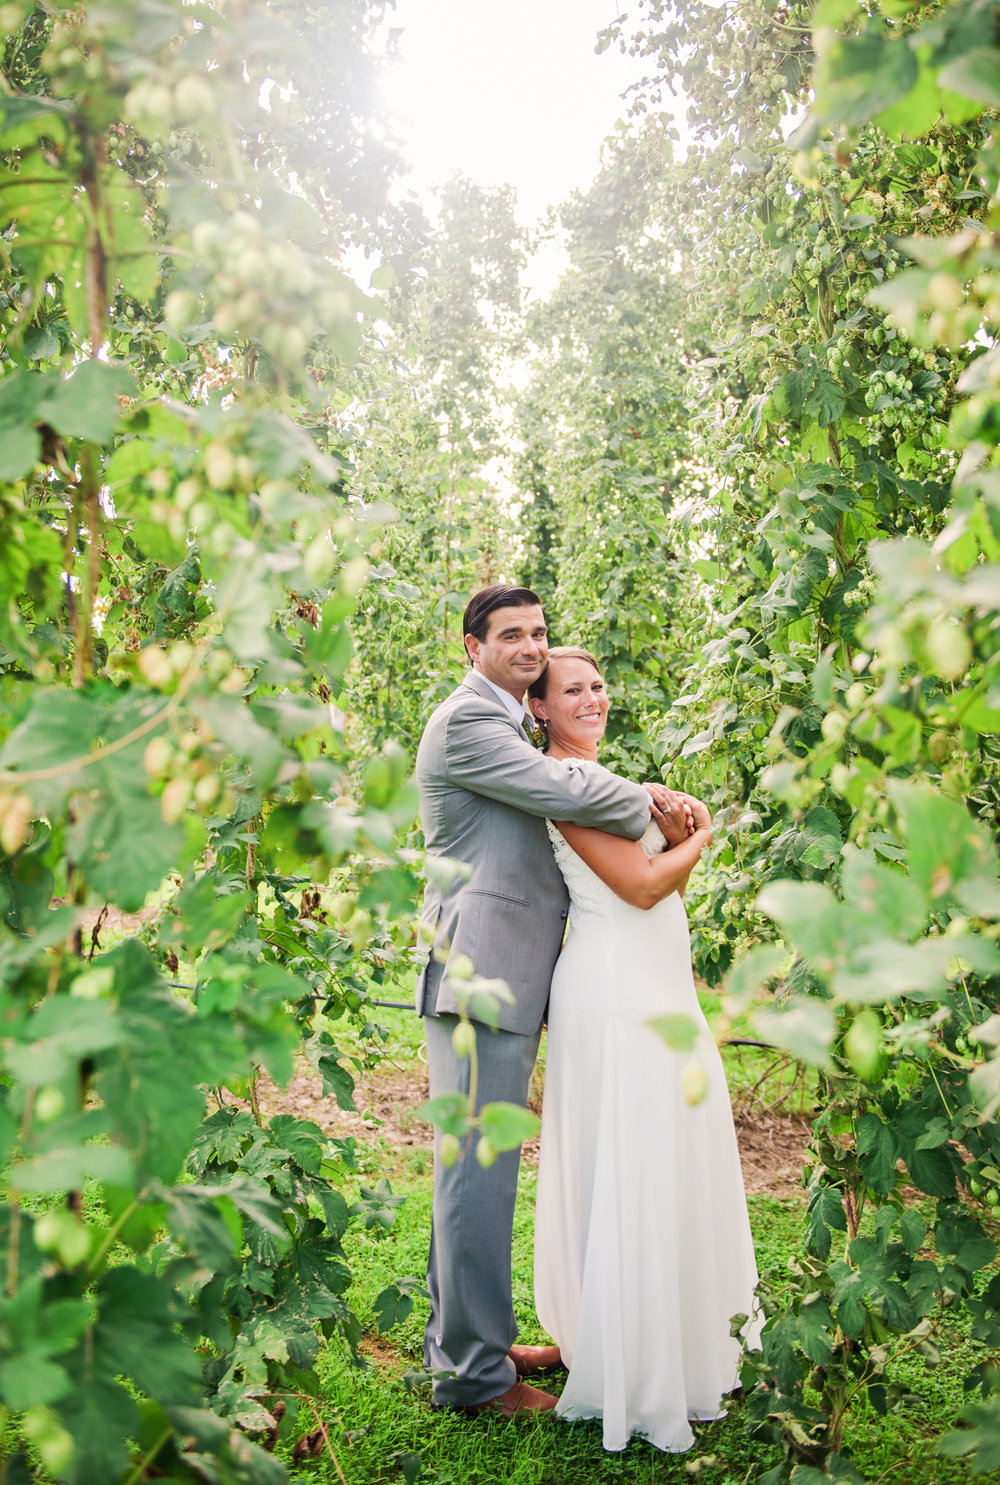 JILL_STUDIO_Wedding_JILL_STUDIO_Rochester_NY_Photographer_19-Climbing_Bines_Finger_Lakes_Wedding_JILL_STUDIO_Rochester_NY_Photographer_170015.jpg